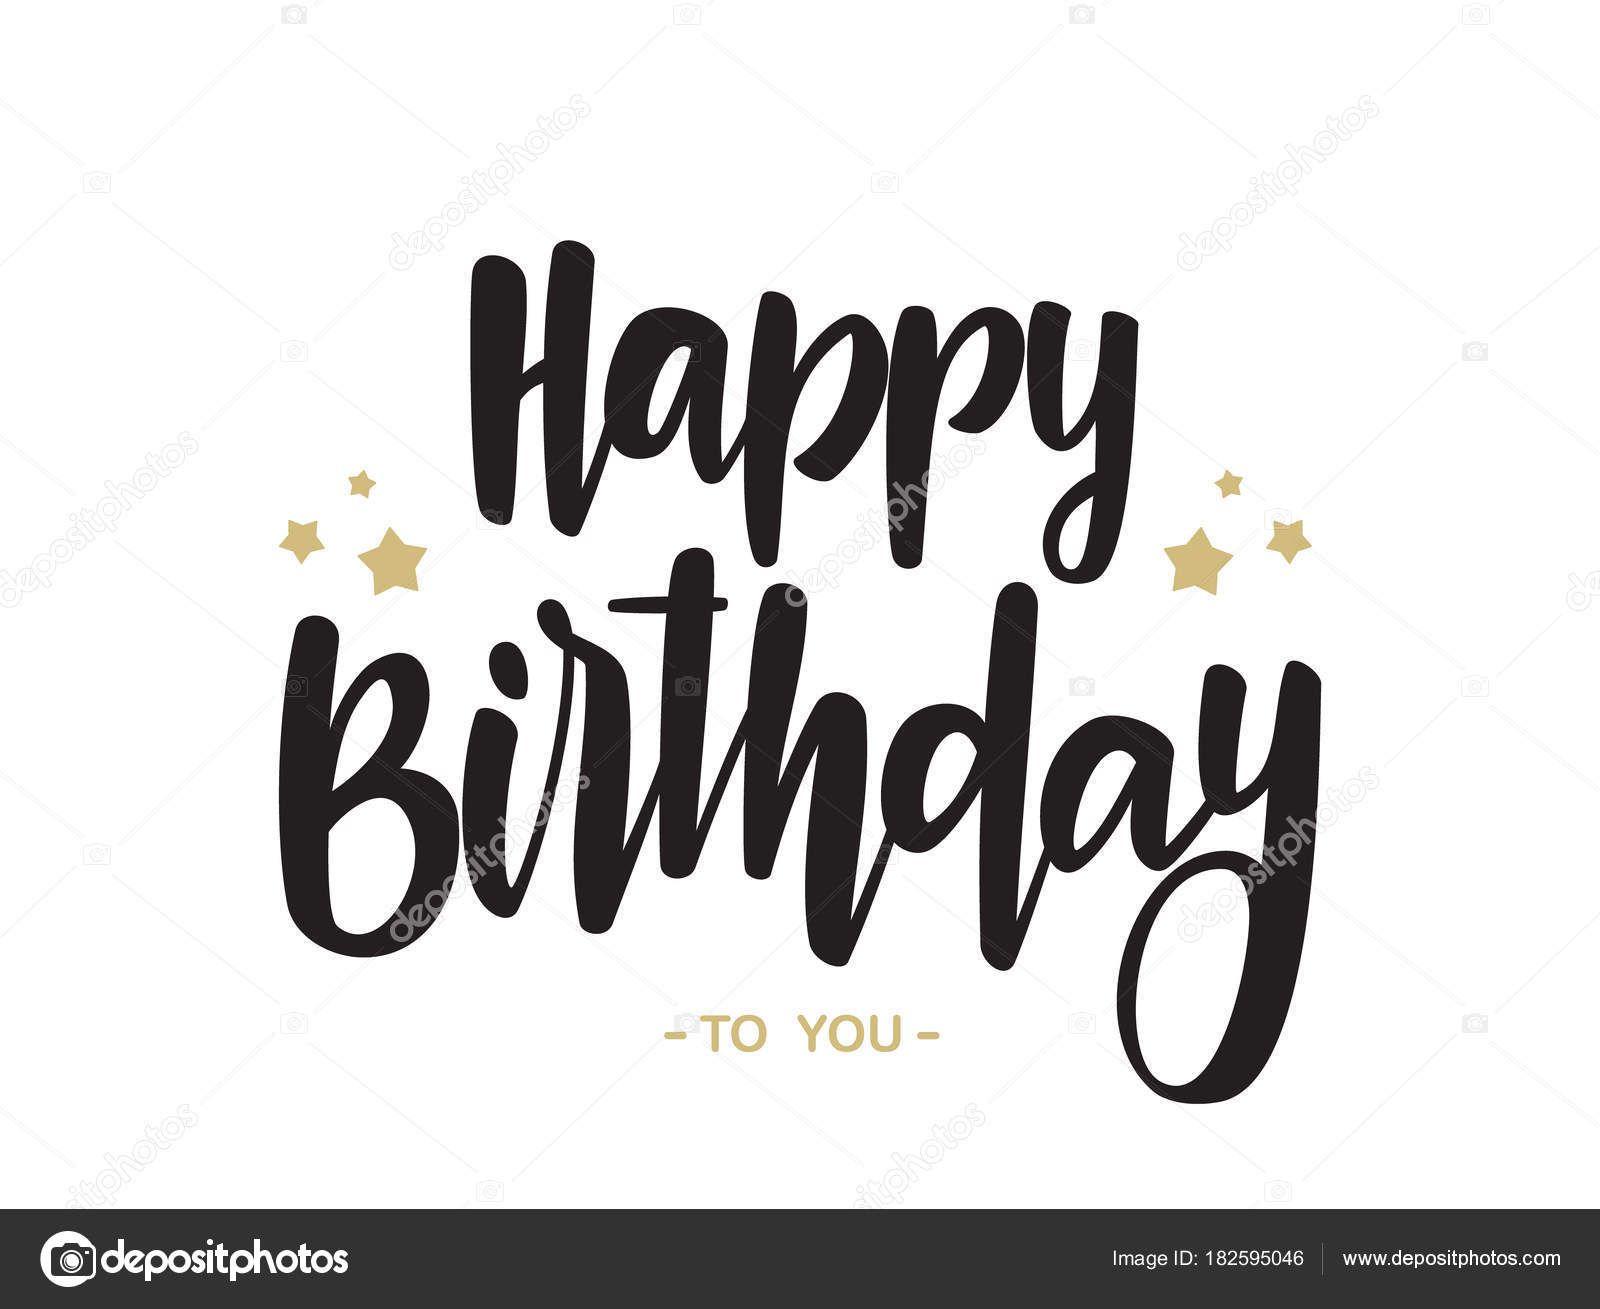 Pin By Jinx On Letras Bonitas Handwritten Type Happy Birthday Typography Lettering